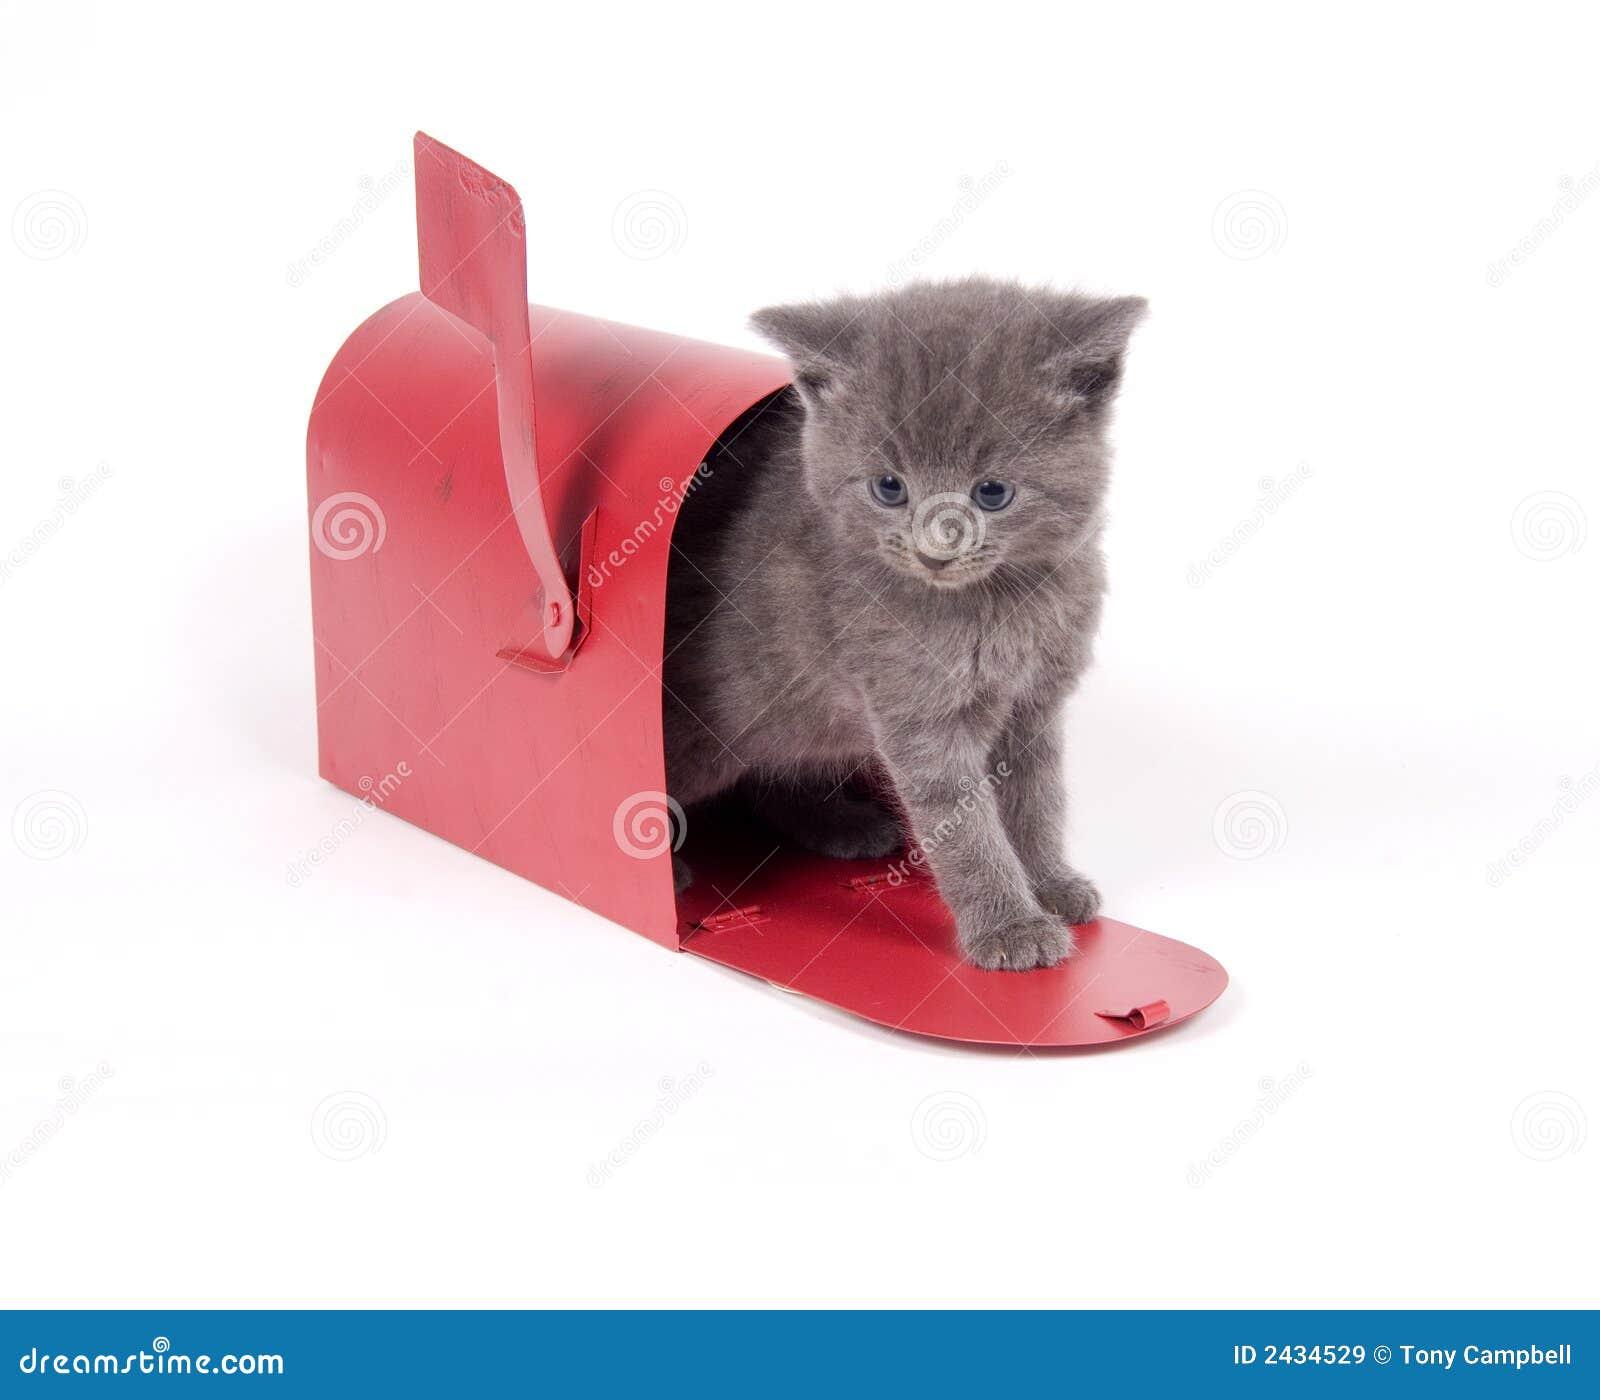 Mail order kitten stock image Image of gray newborn